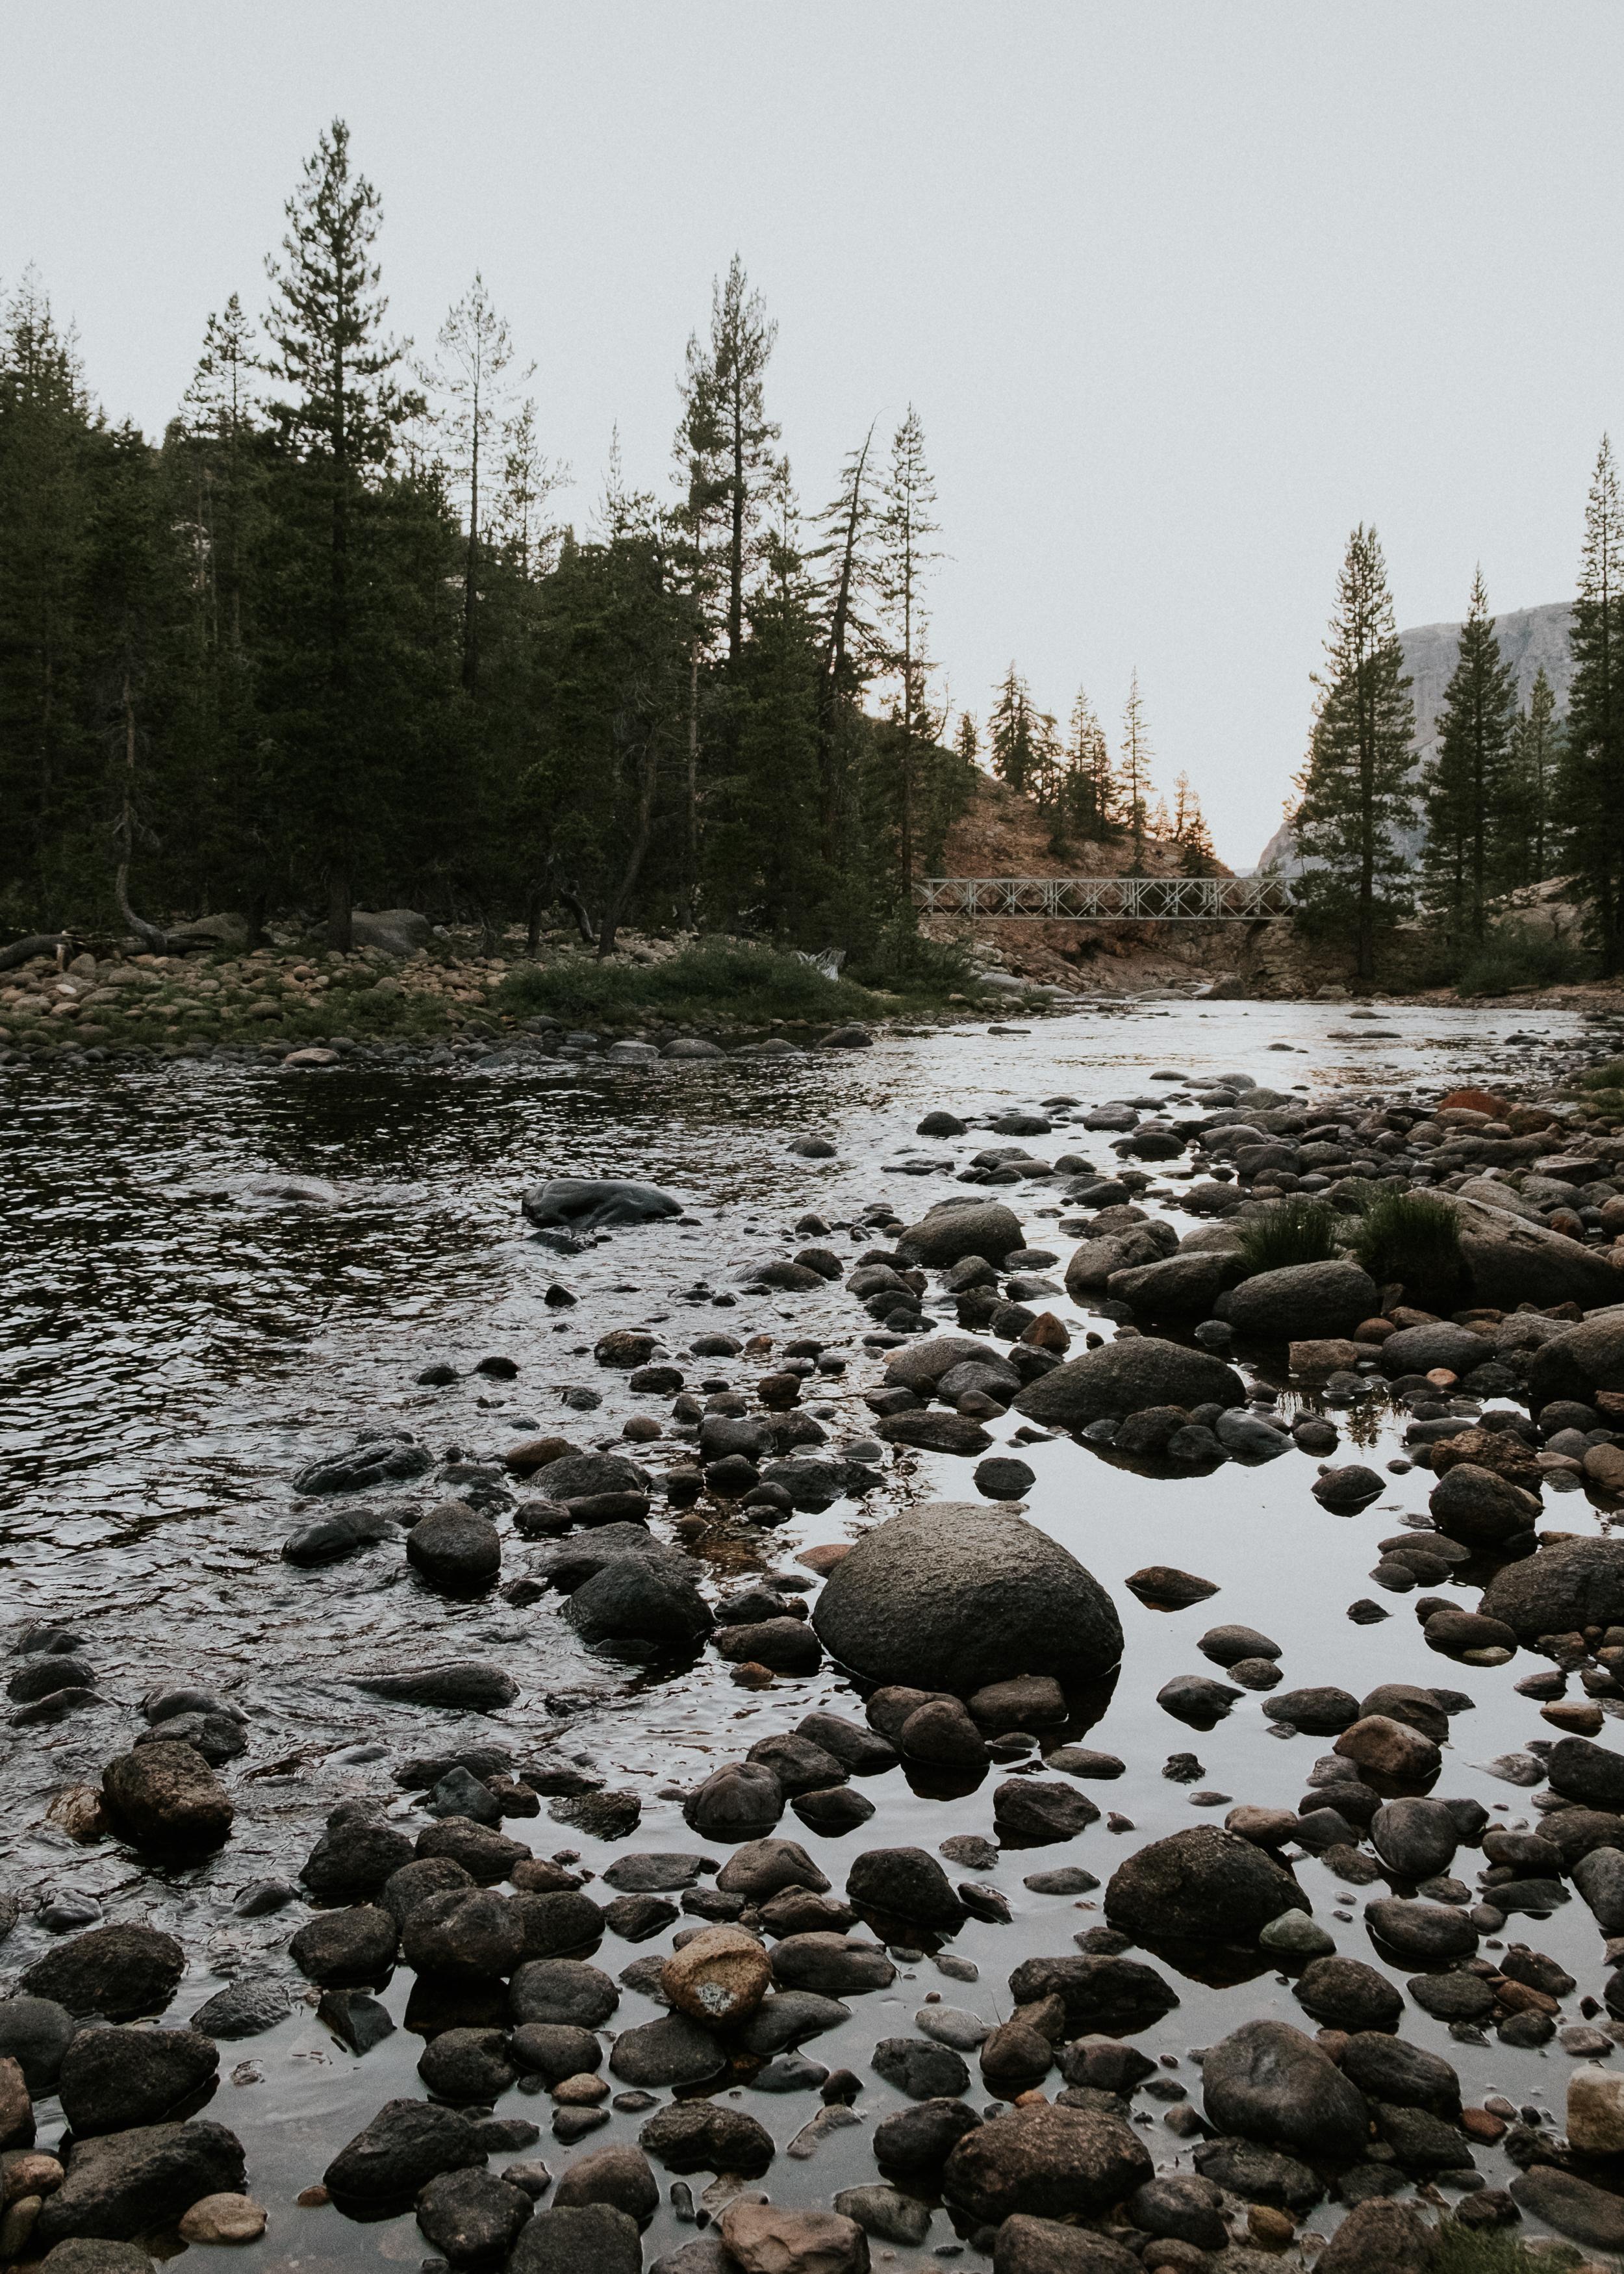 glen-aulin-camp-yosemite.jpg